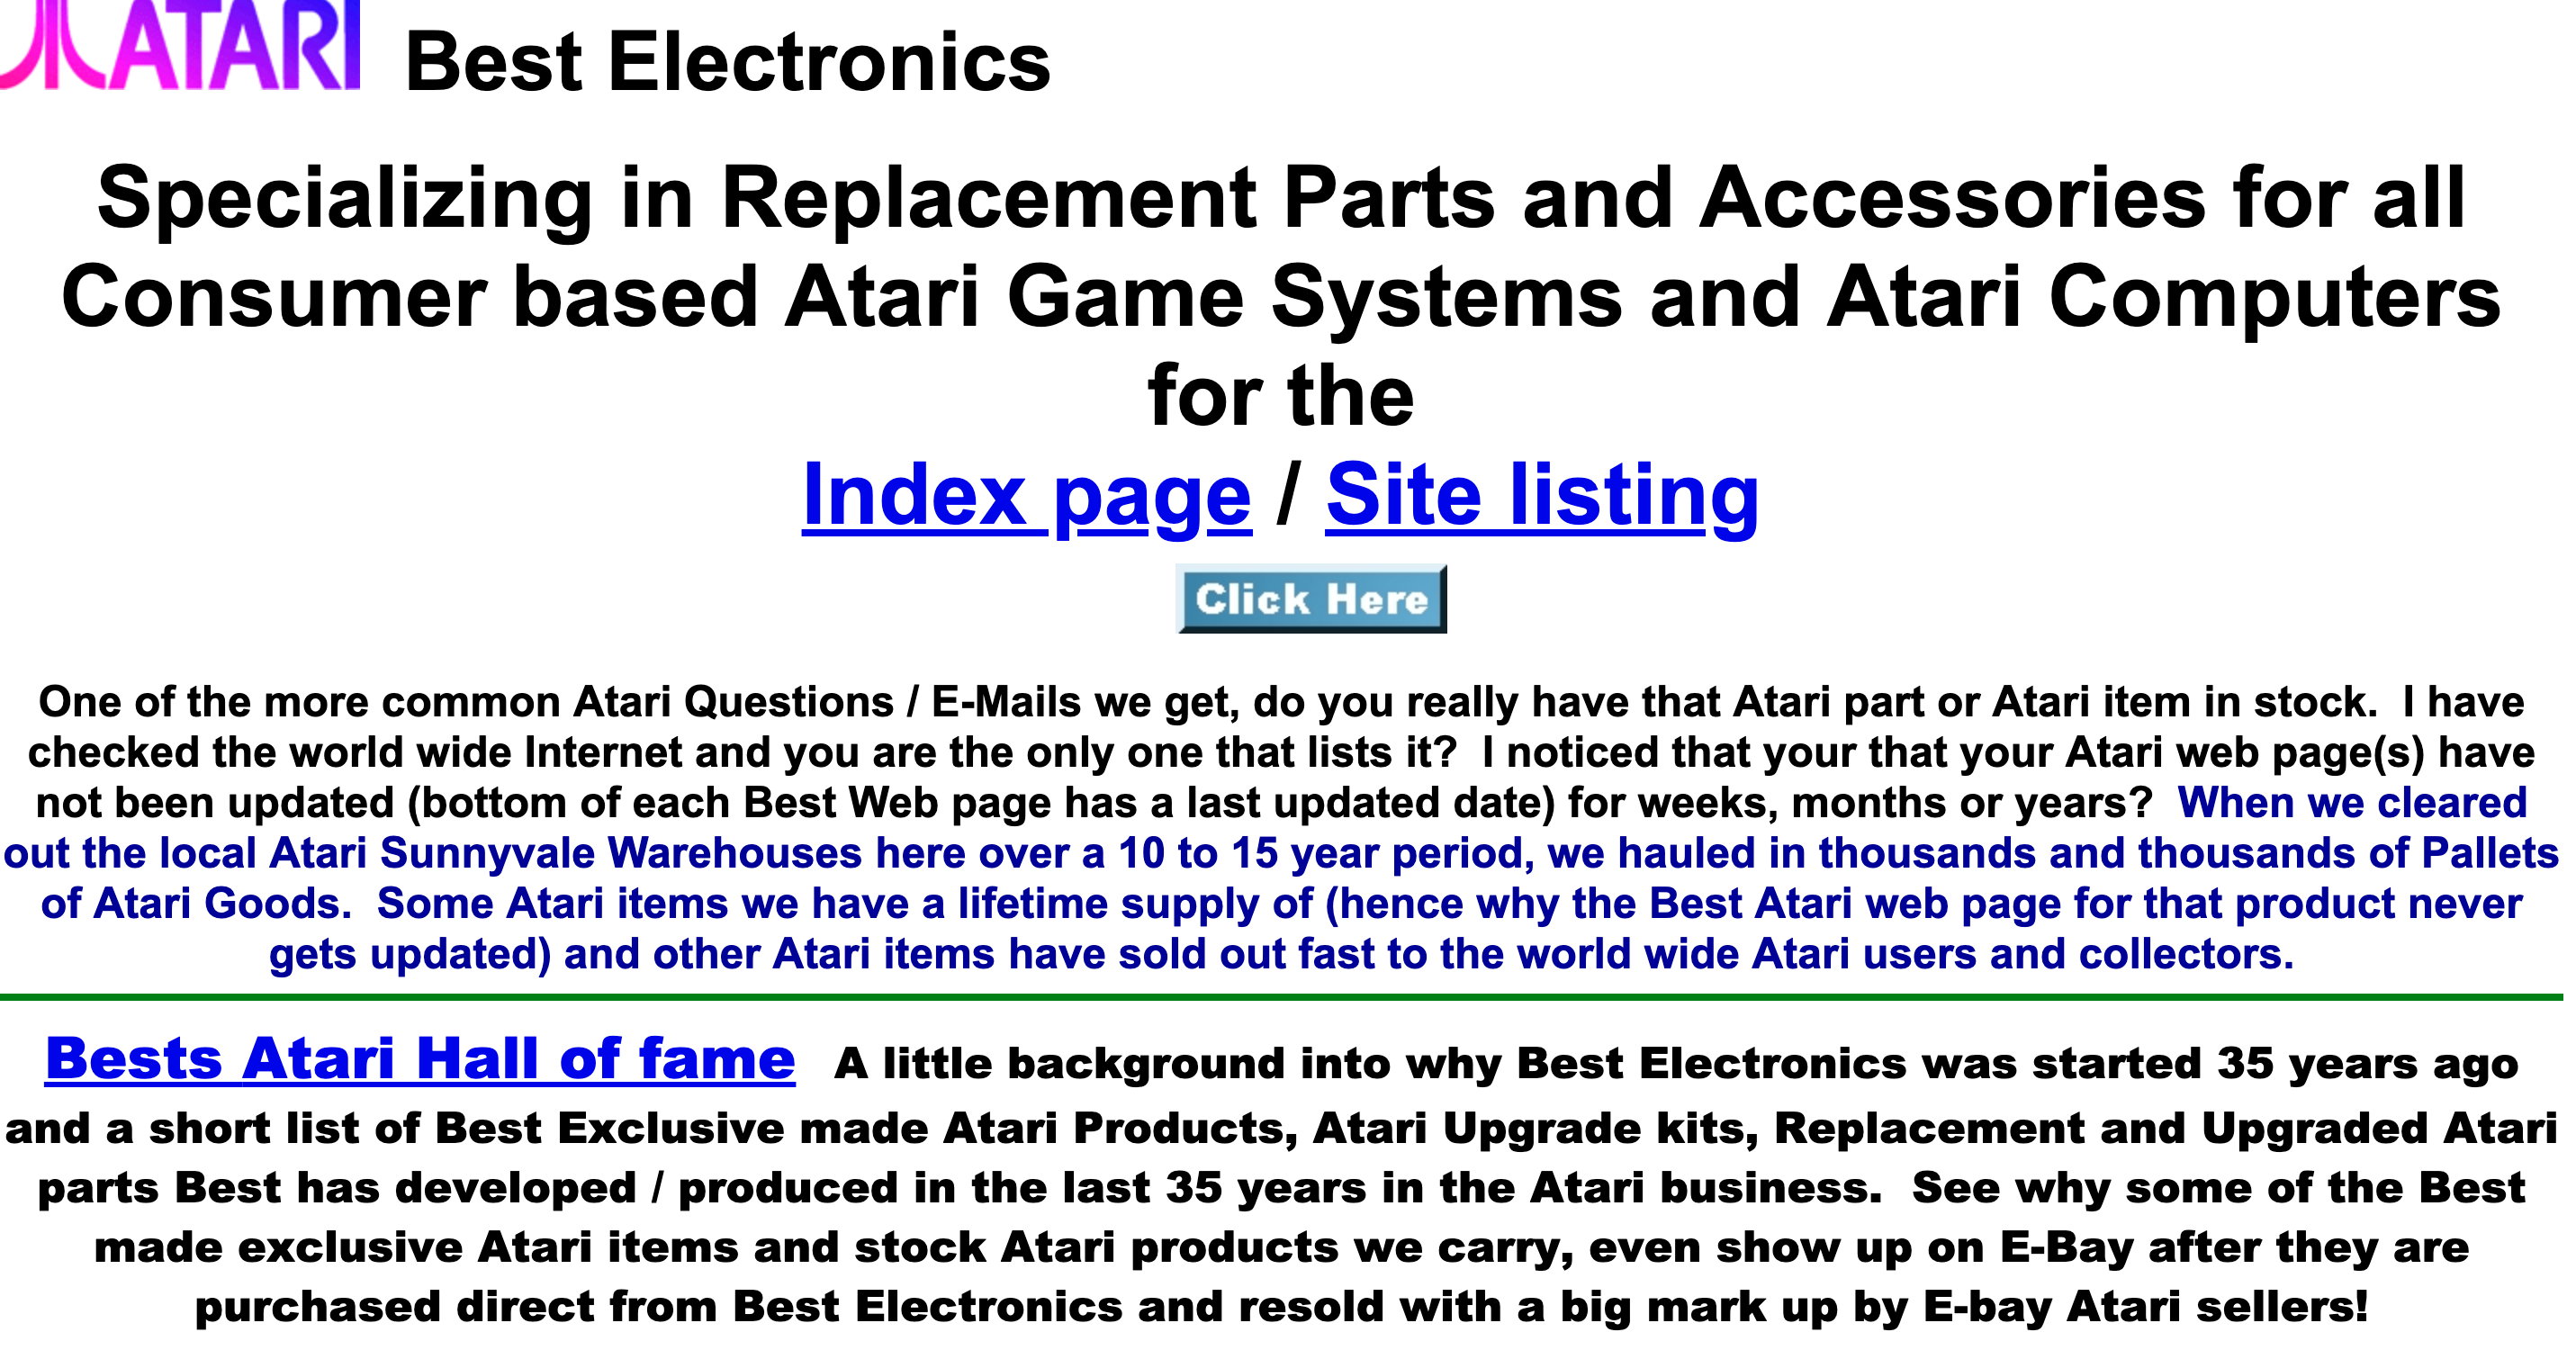 Bad website example - Best Electronics